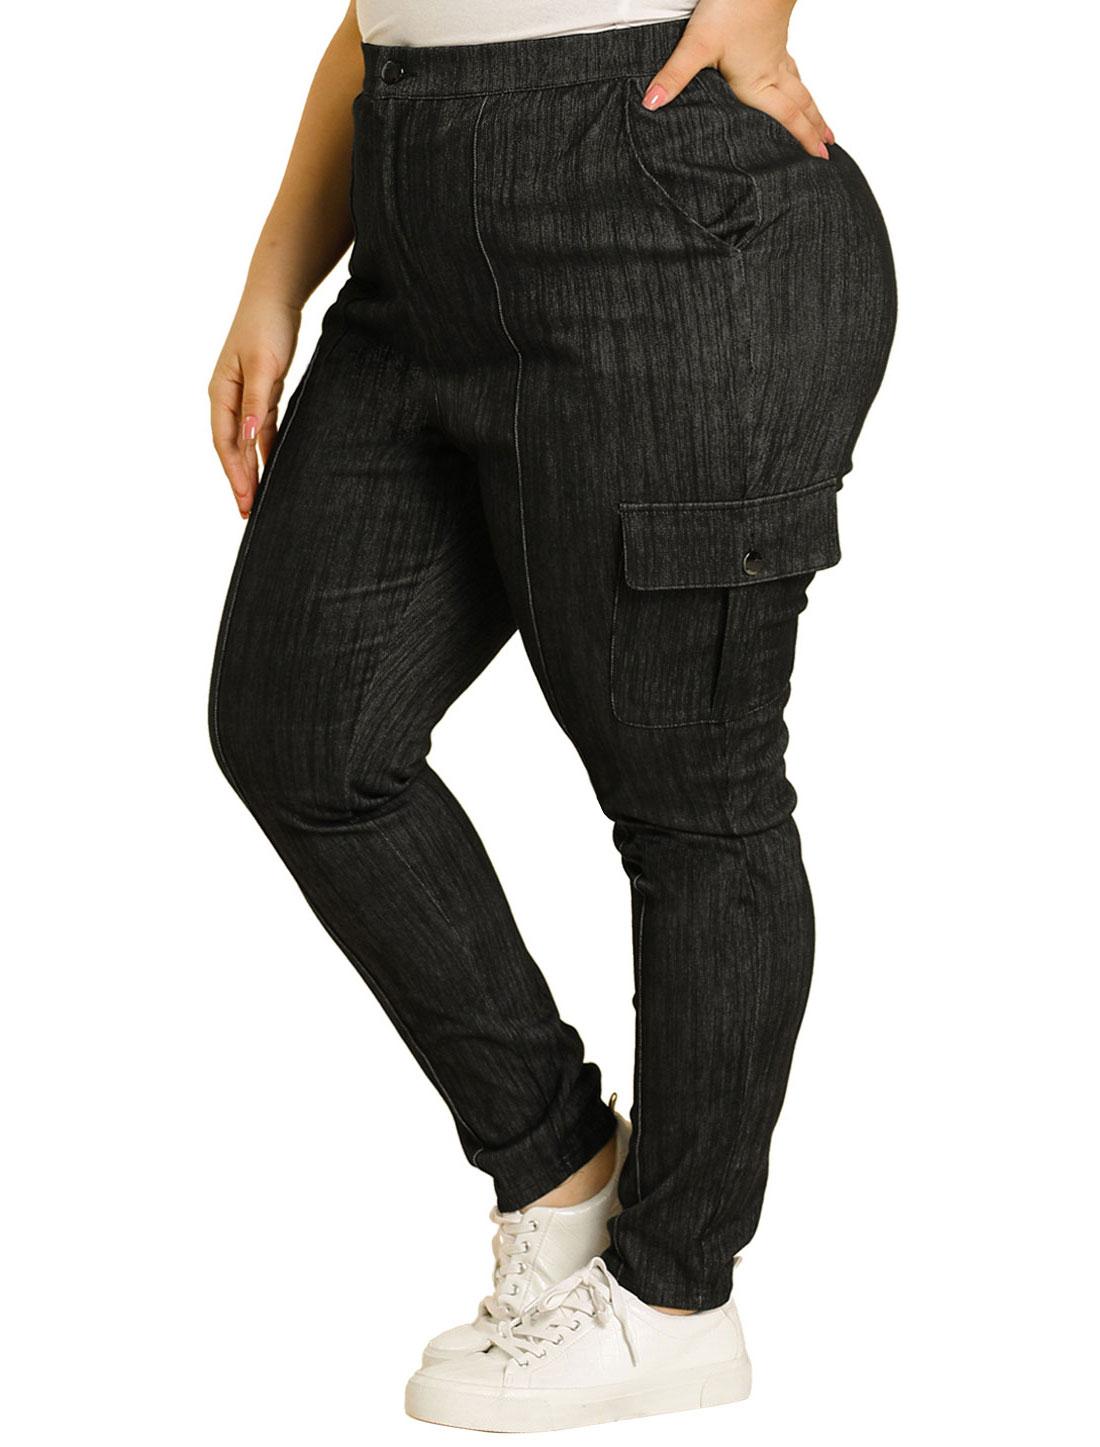 Women's Plus Size Joggers Skinny Contrast Color Ponte Casual Pants Black 3X